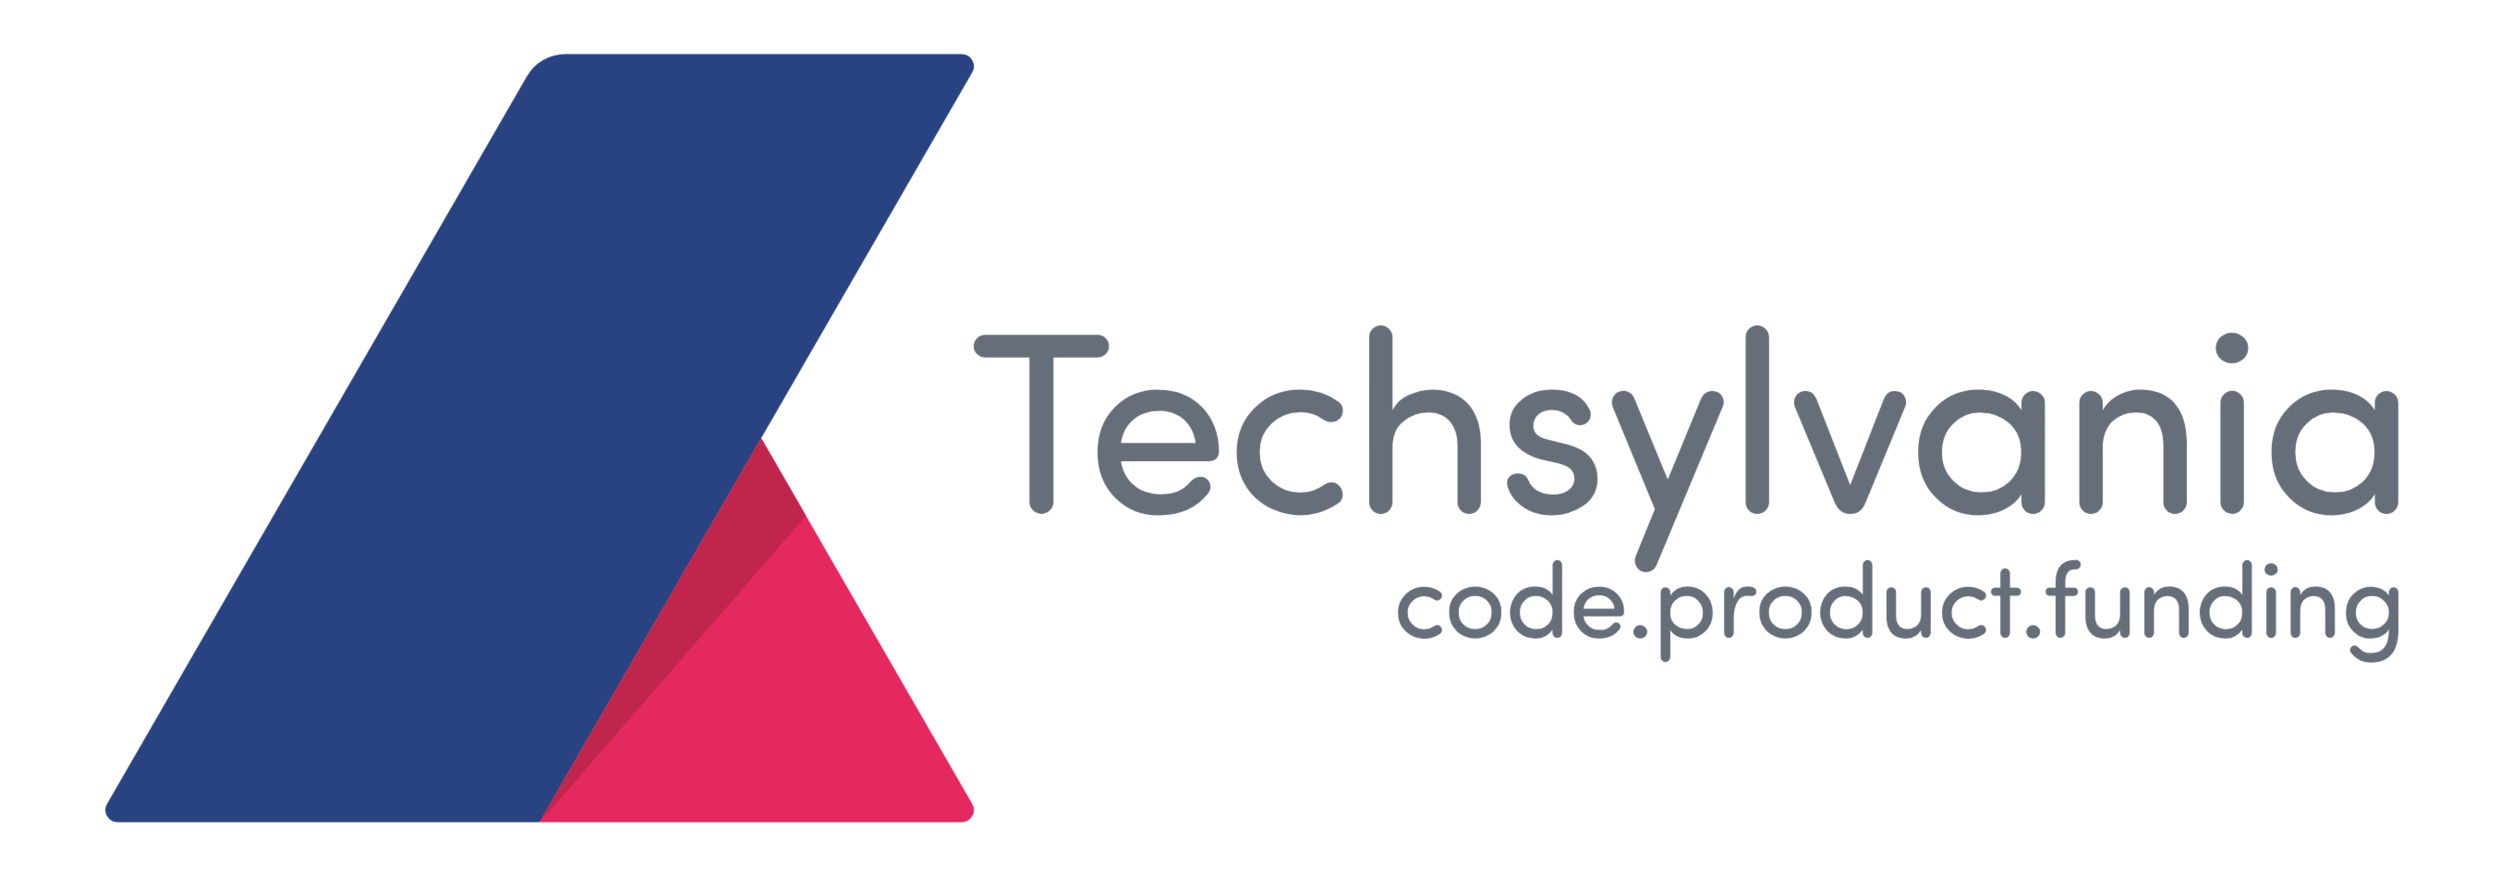 Techsylvania.png